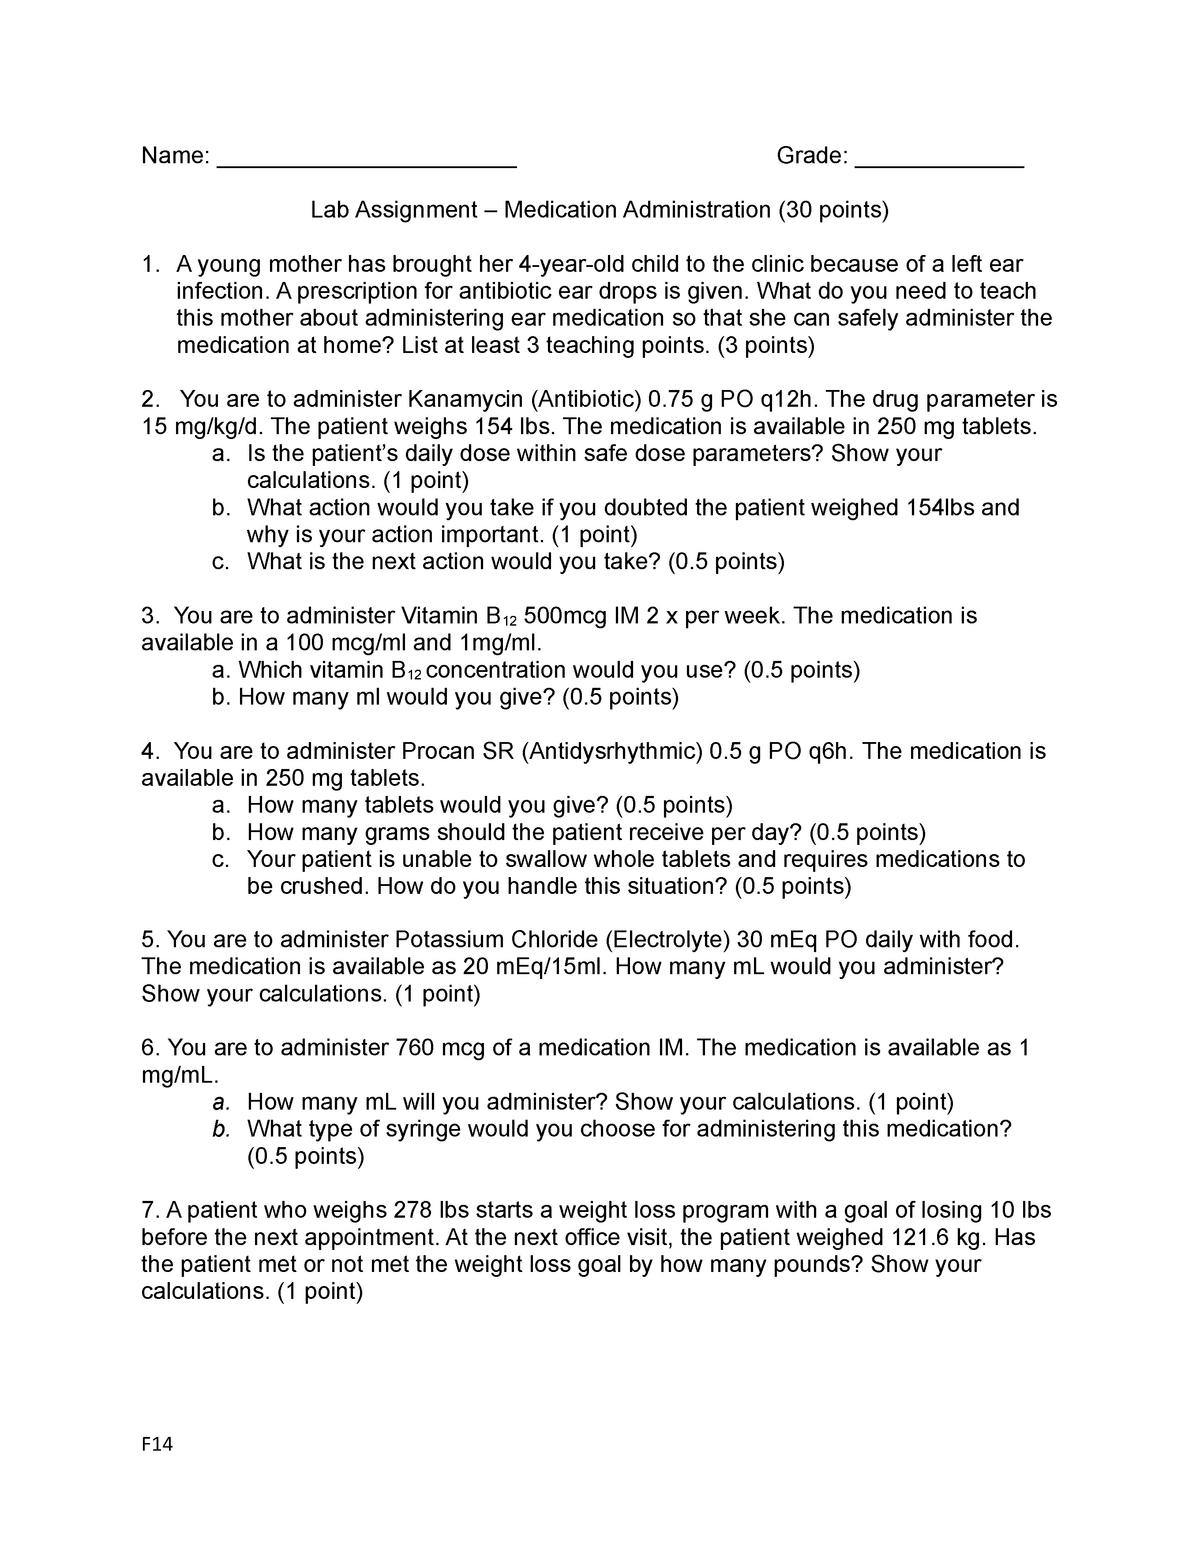 2221 Medication Administration F16 Lab Assignment - NRSG